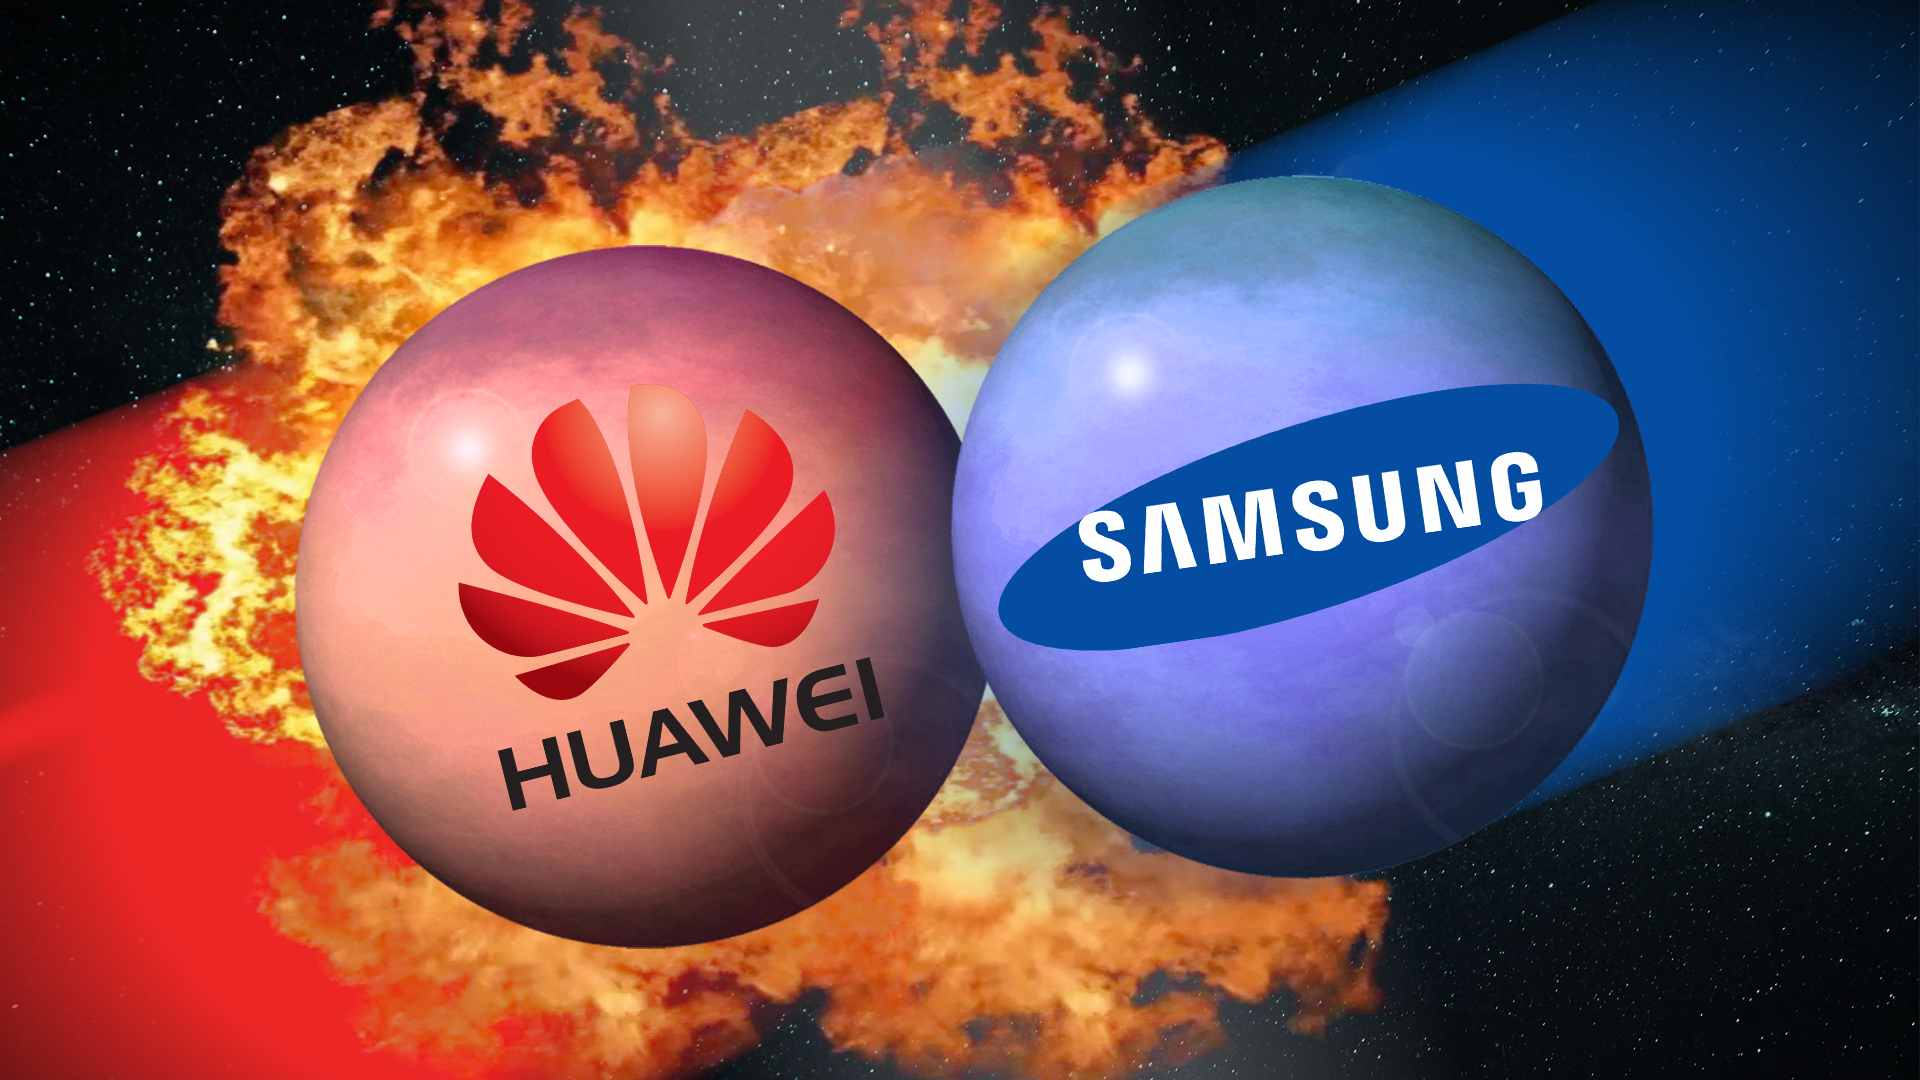 huawei vs samsung marché smartphones mondial